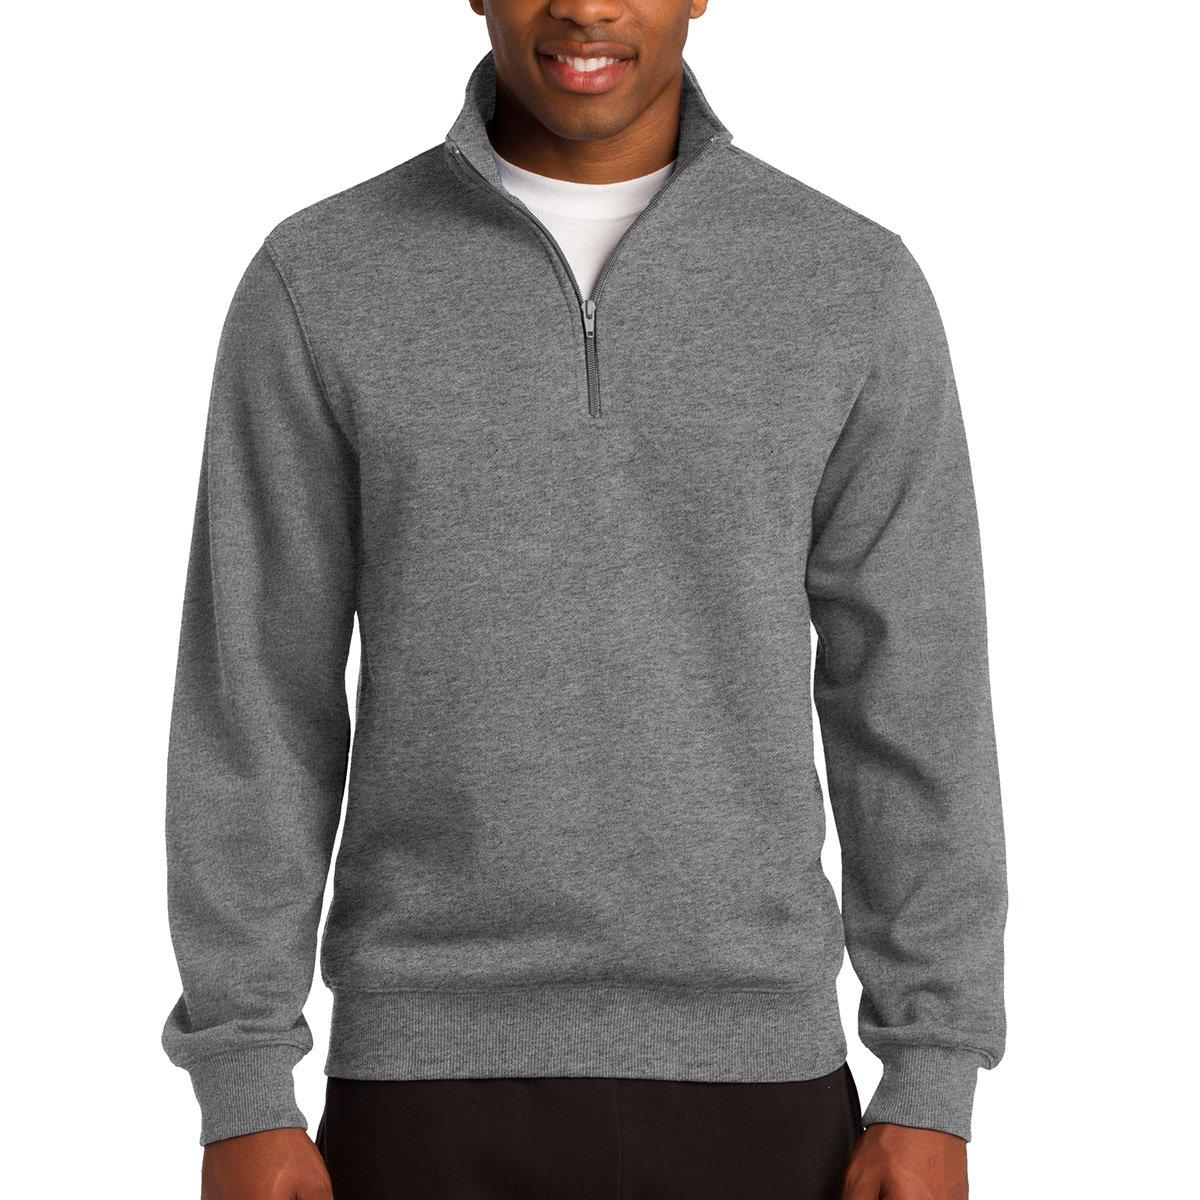 2XLT Graphite Heather Sport-Tek Mens Tall 1//4-Zip Sweatshirt